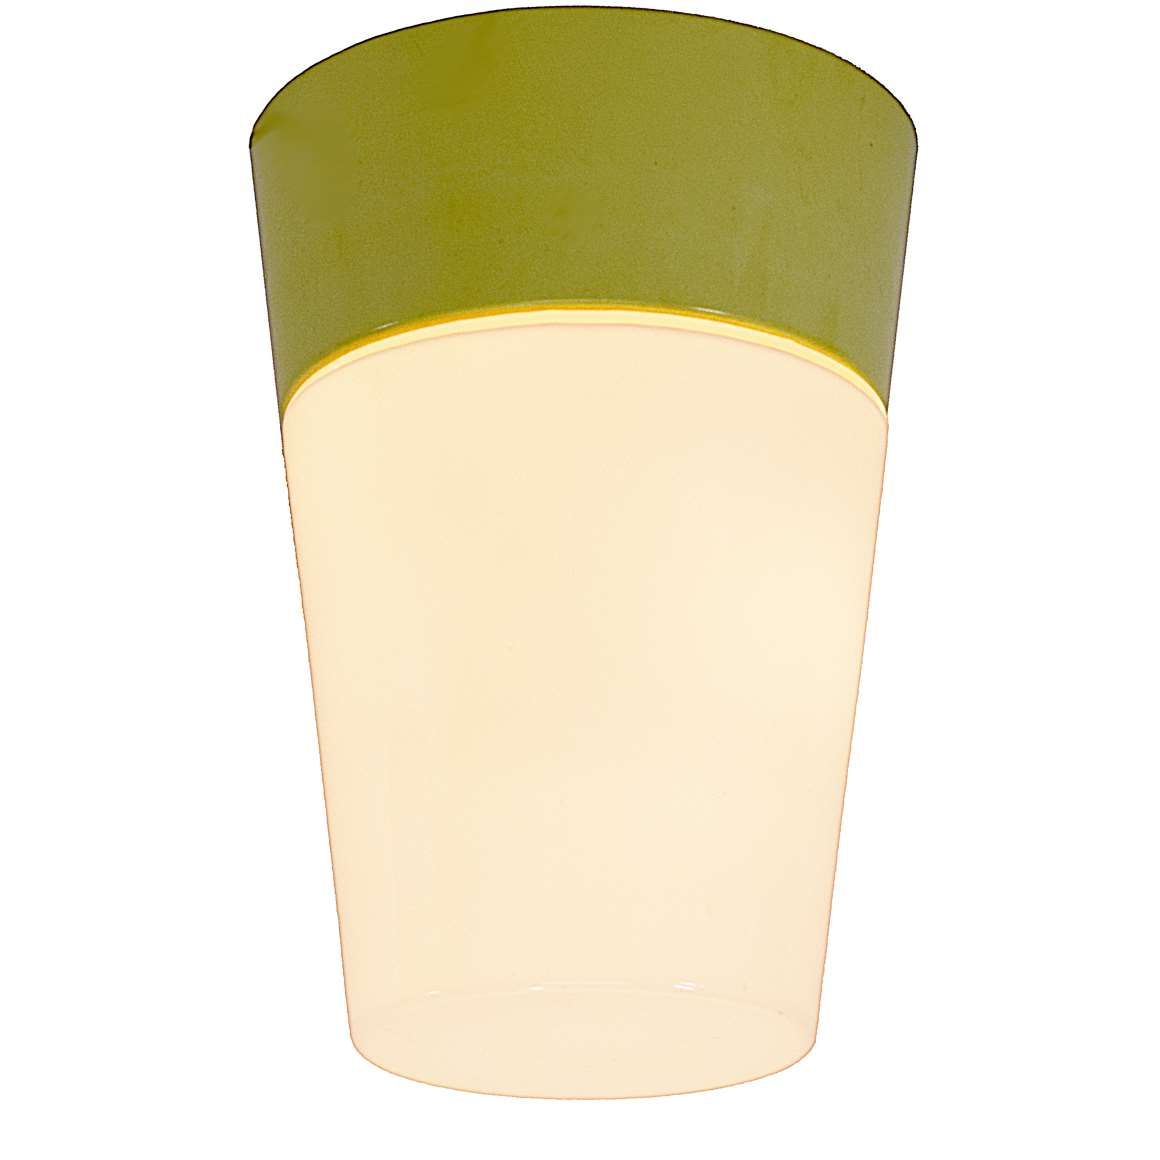 HoSo Olive Green Bakelite Flush Mount conical white opal glass 1950s 1960s Hoffmeister ceiling lamp MCM